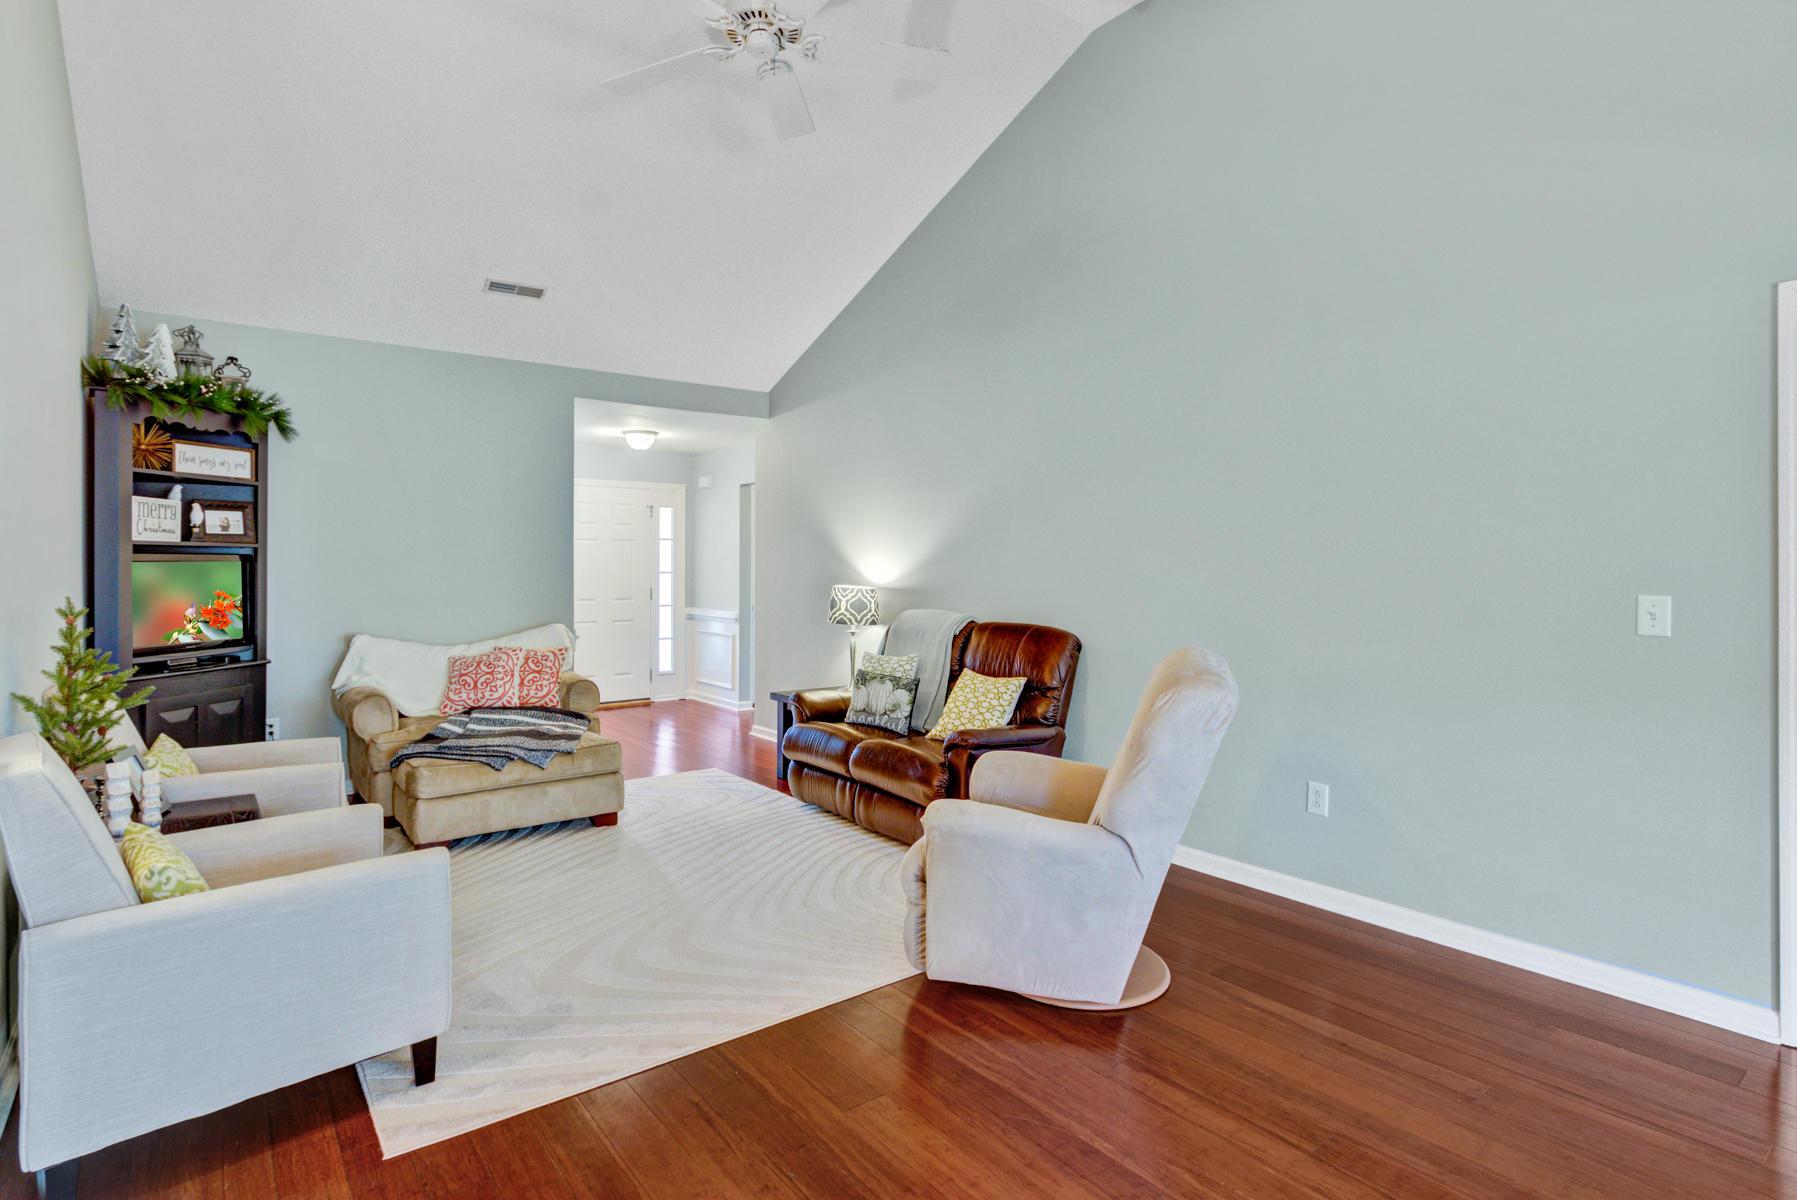 Park West Homes For Sale - 3444 Wellesley, Mount Pleasant, SC - 21